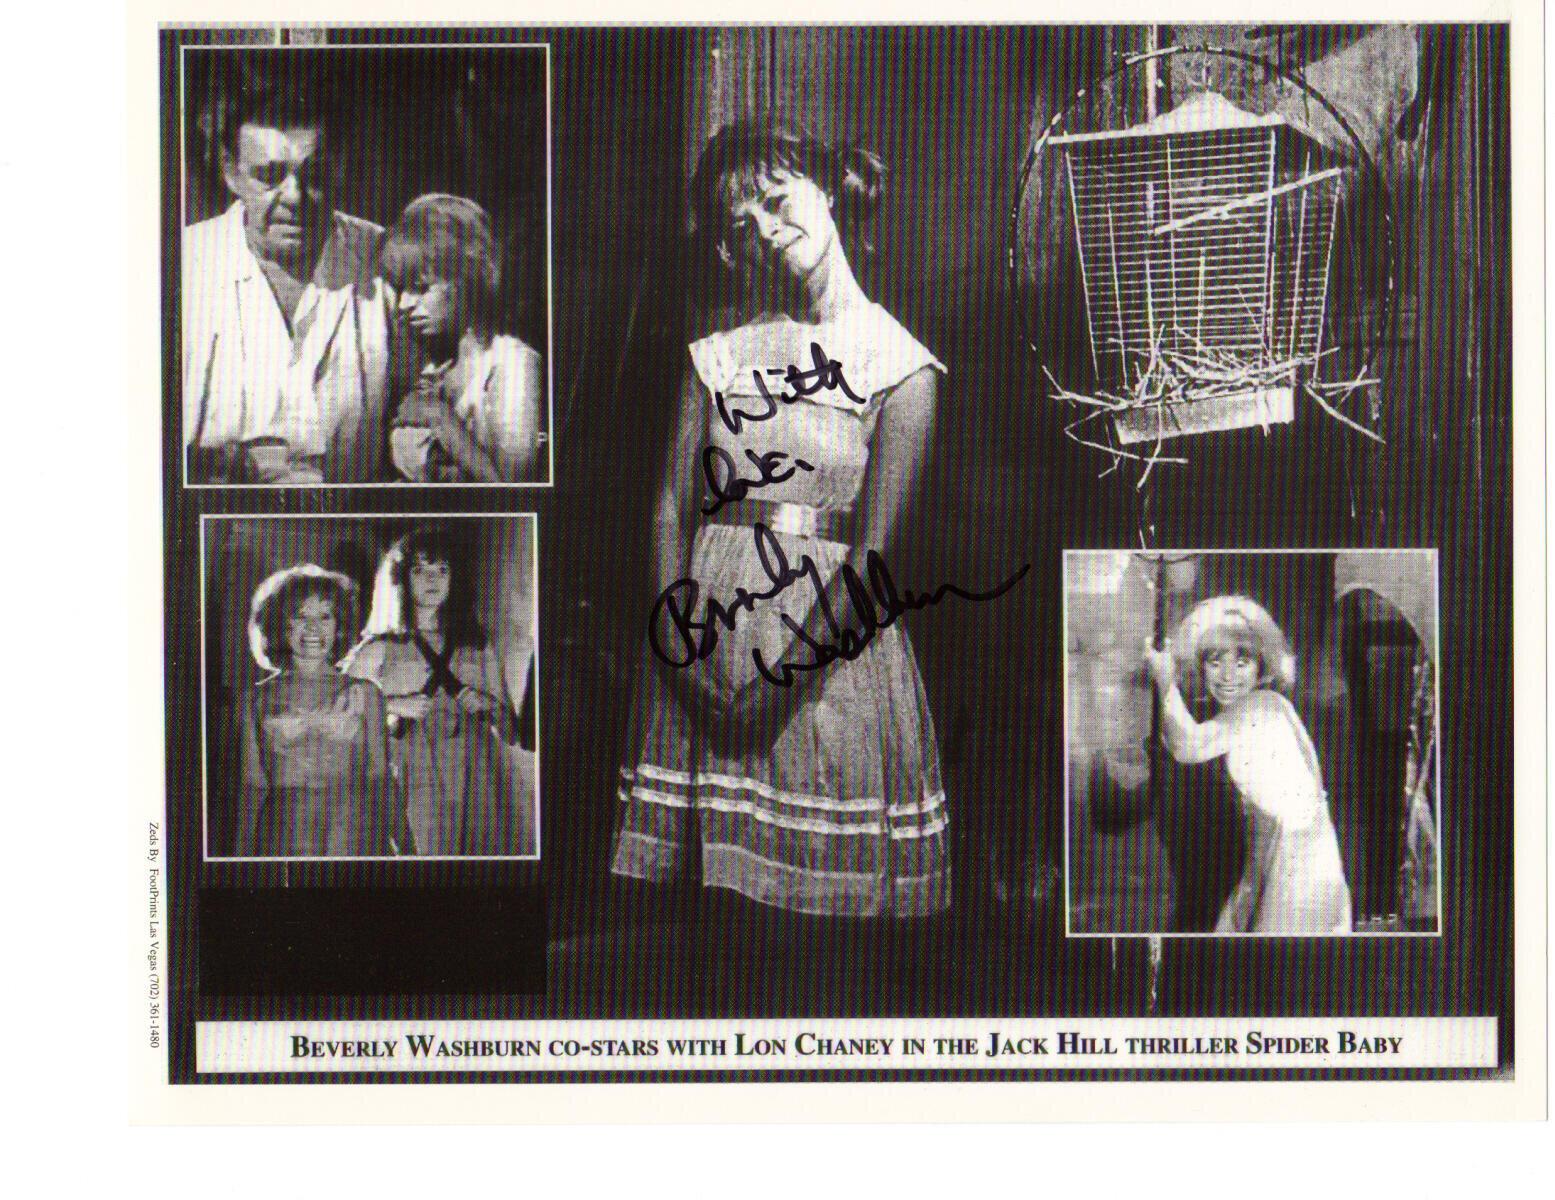 Beverly Washburn Net Worth & Biography 2017 - Stunning ...